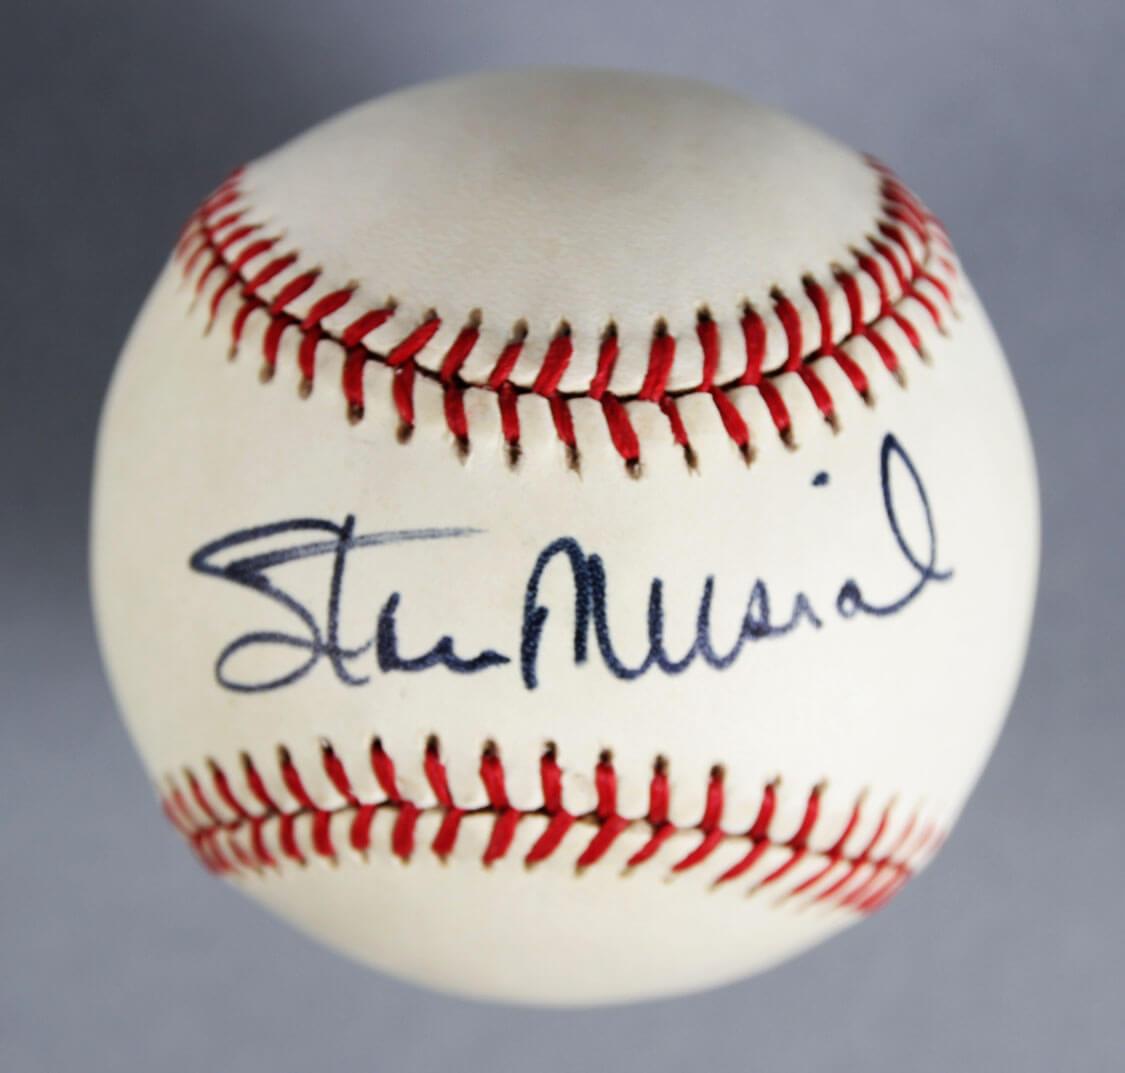 Stan Musial Signed St. Louis Cardinals Baseball - COA